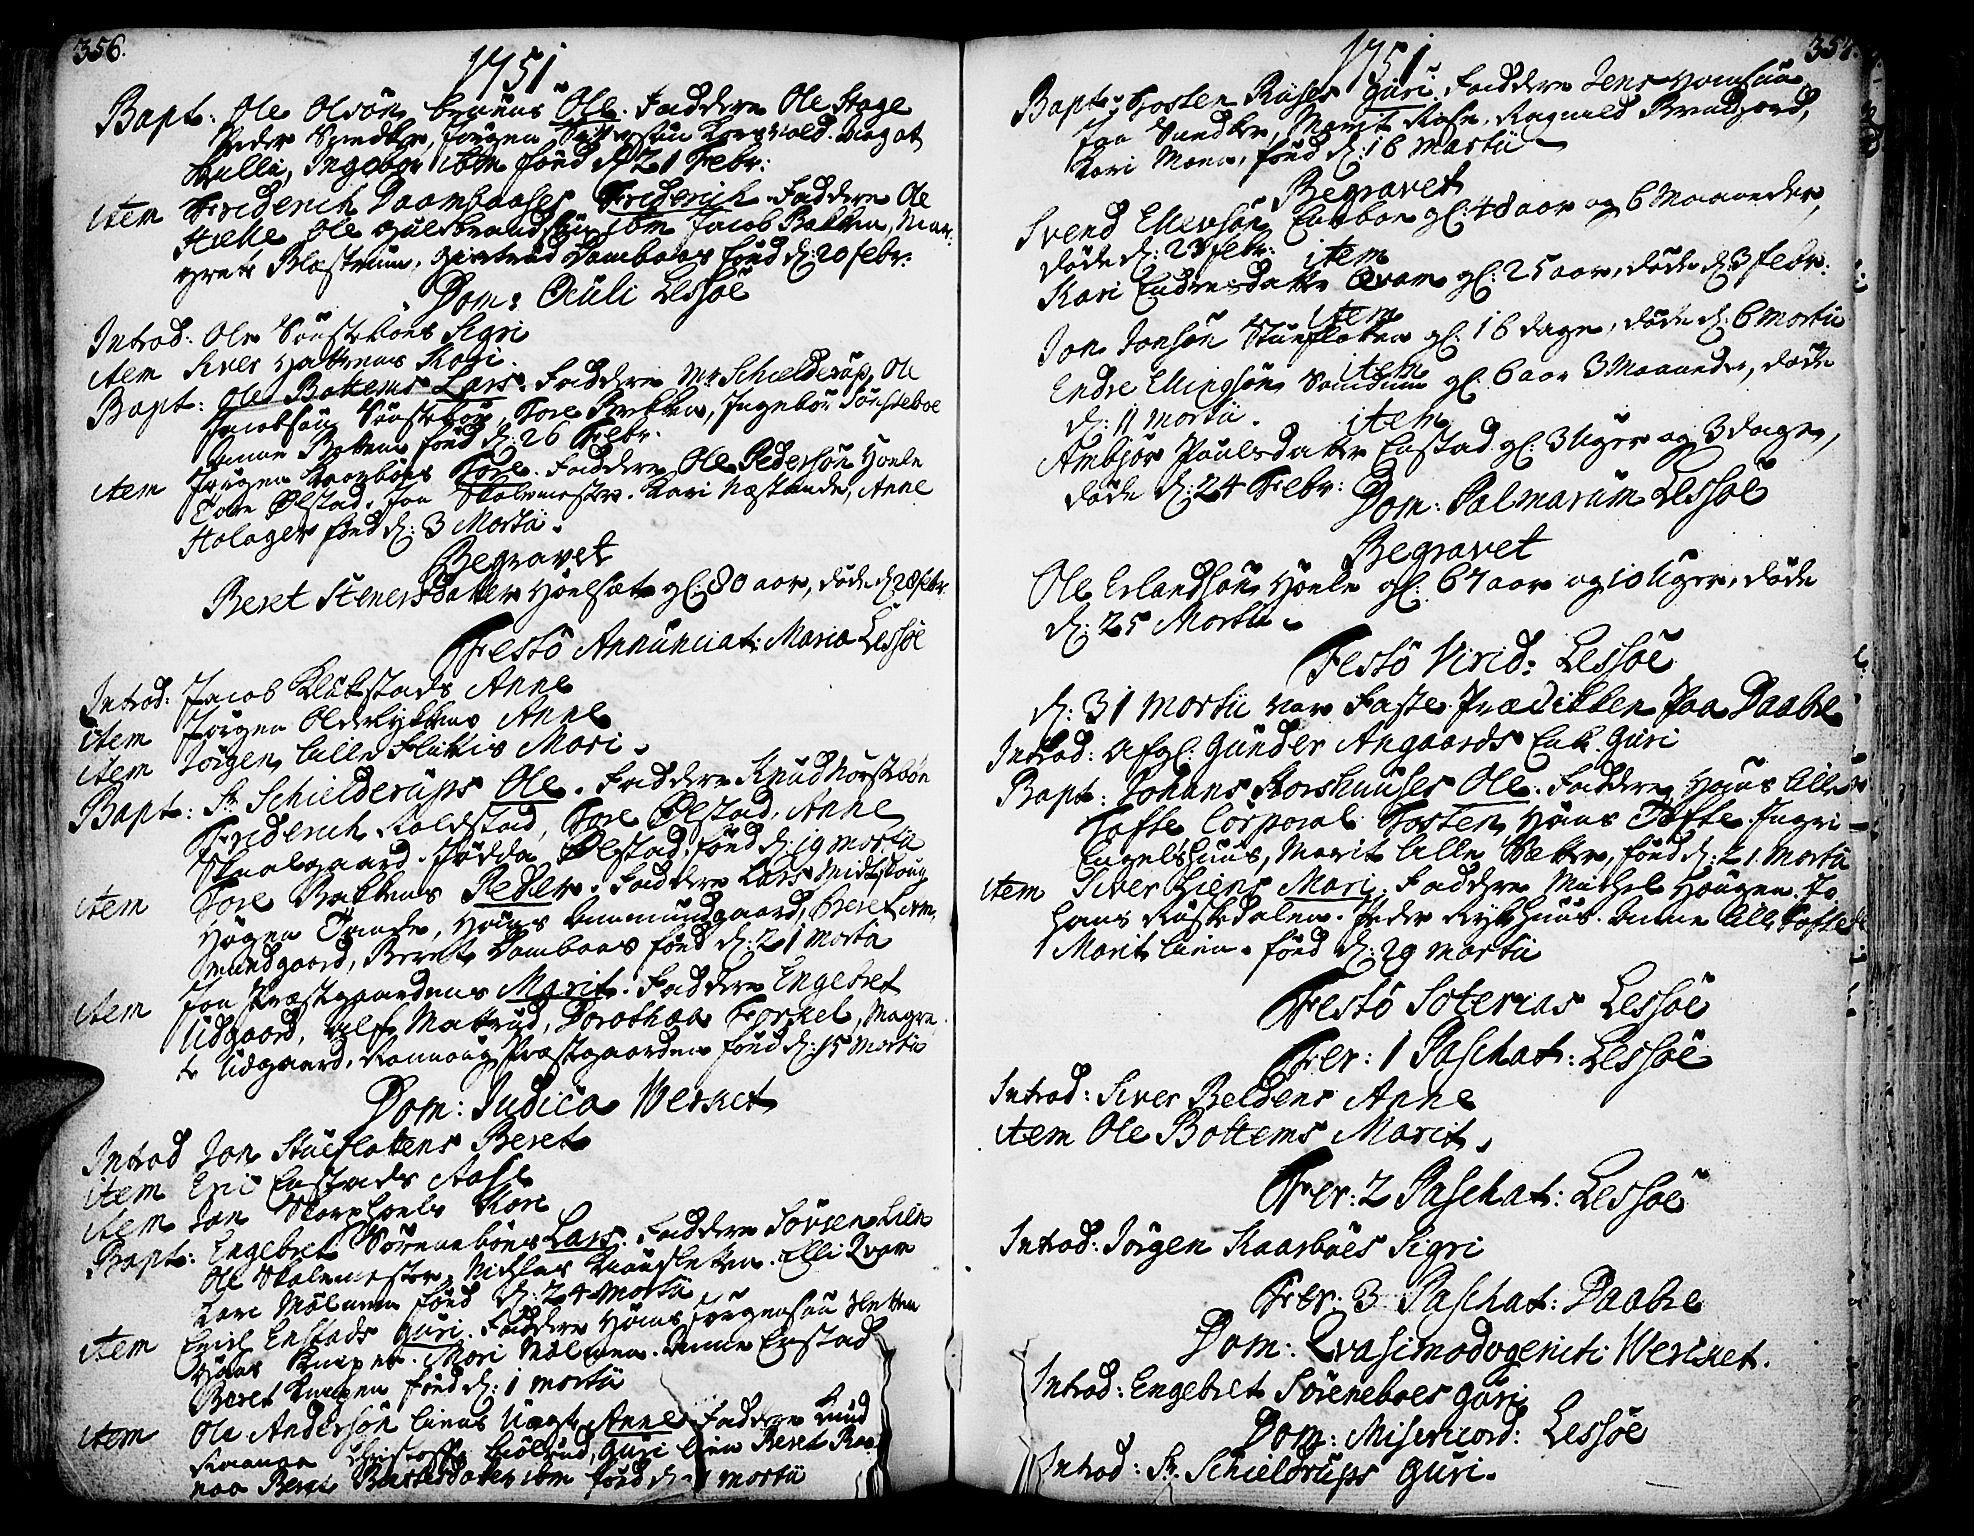 SAH, Lesja prestekontor, Ministerialbok nr. 2, 1732-1776, s. 356-357